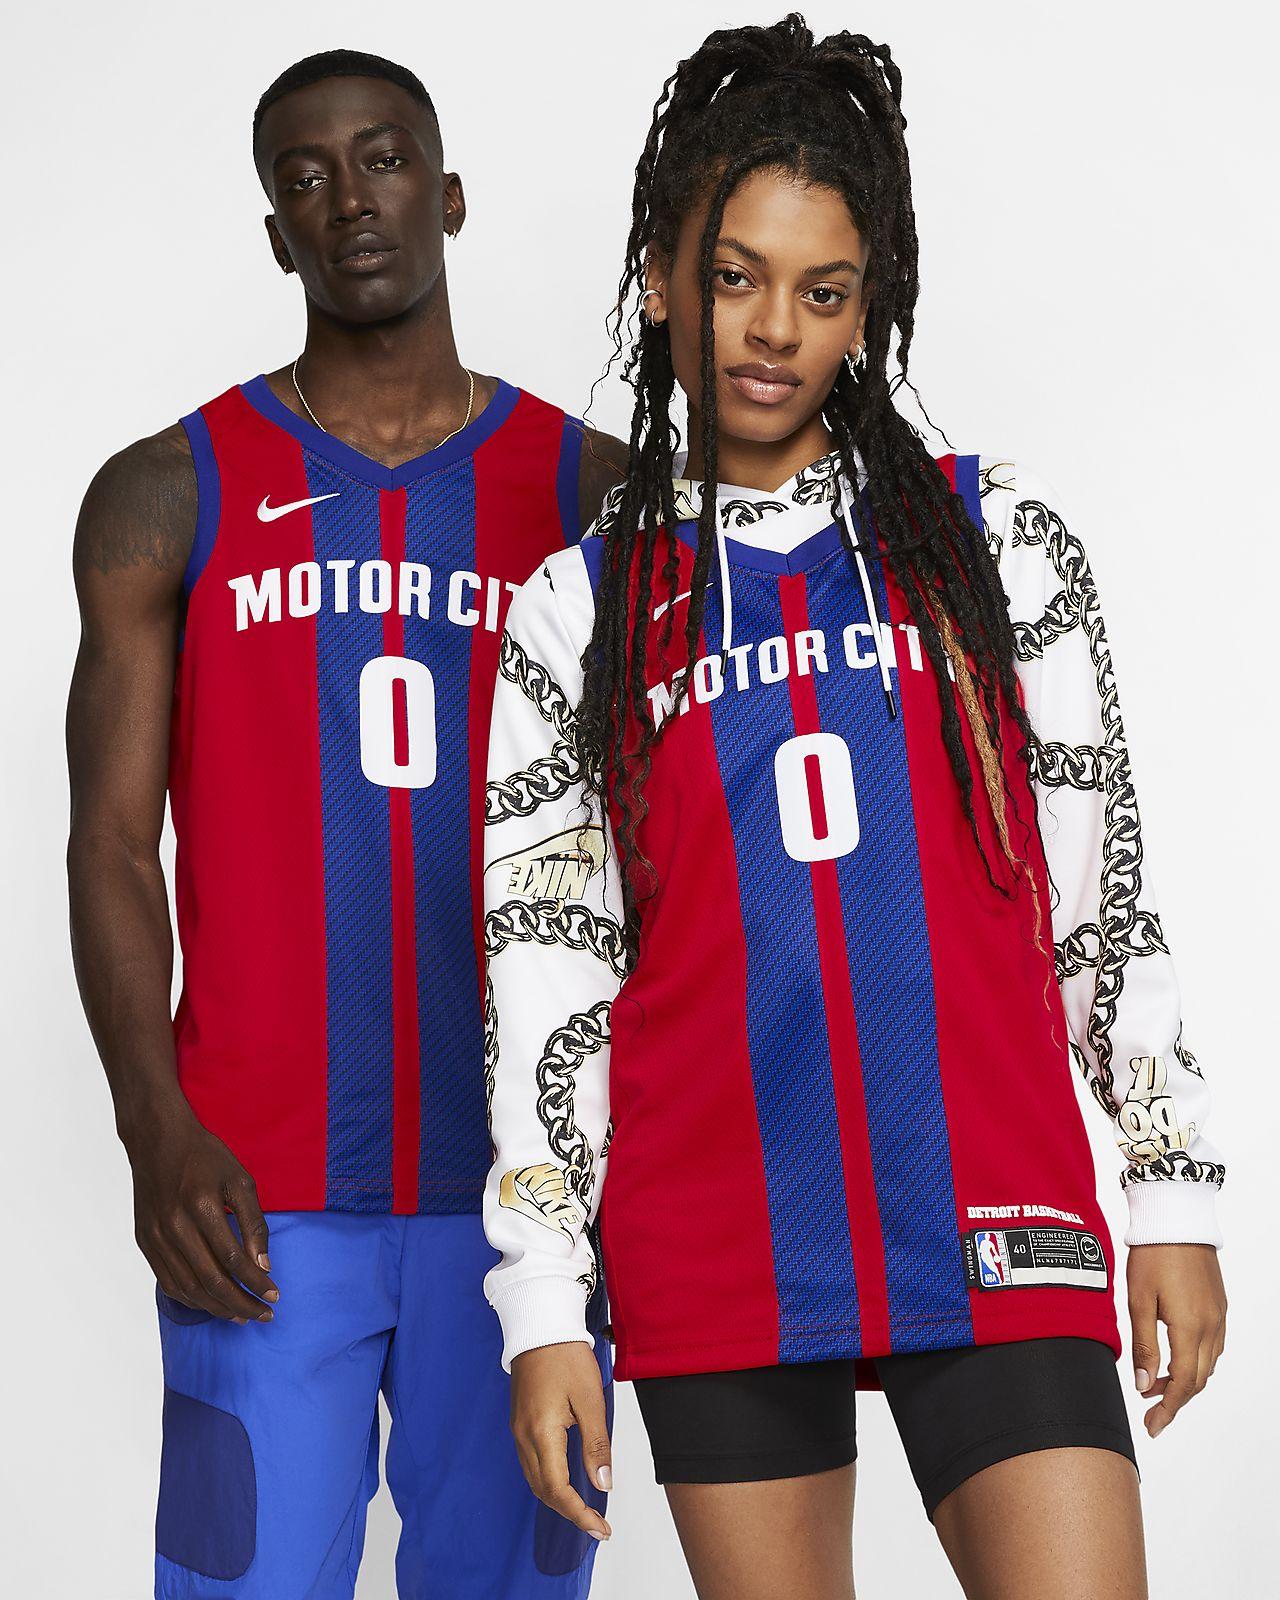 Maillot Nike NBA Swingman Andre Drummond Pistons - City Edition